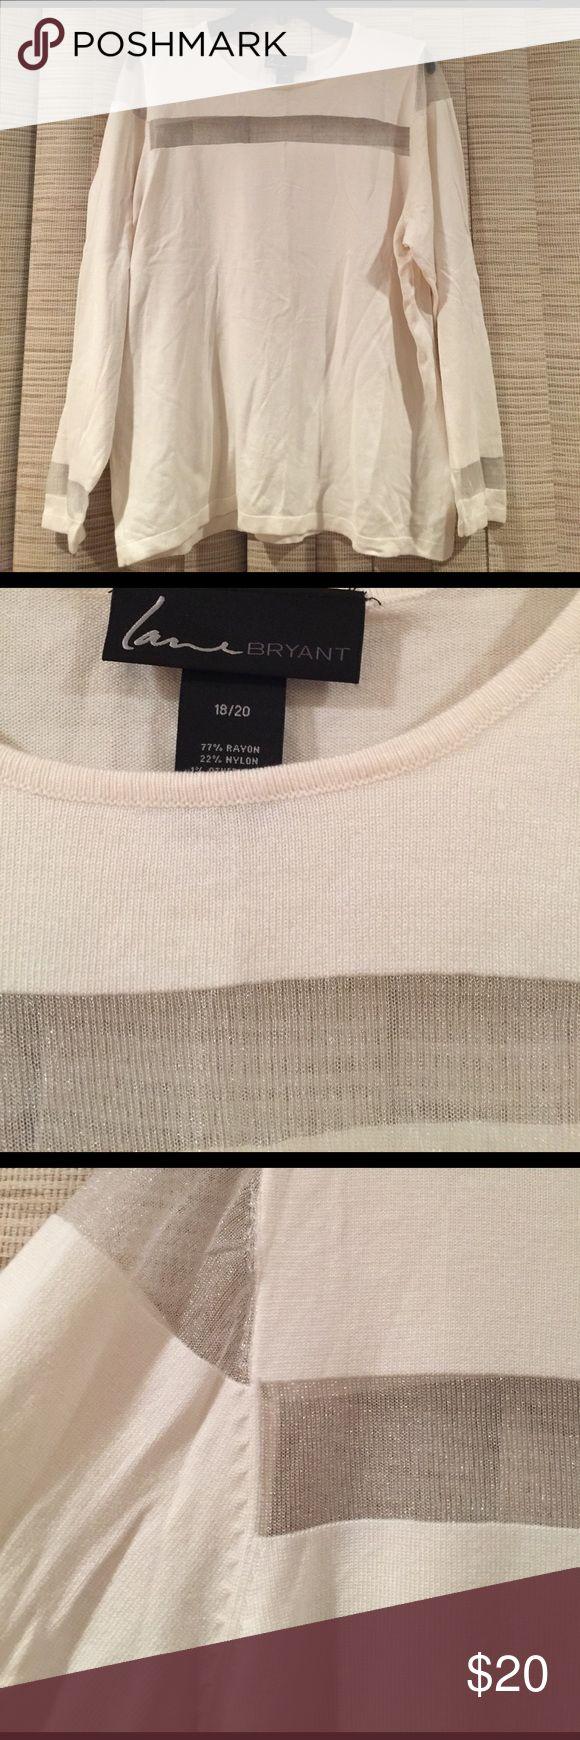 Beautiful cream sweater w/sheer stripes 18/20 Beautiful cream sweater w/sheer stripes 18/20 long sleeve lane bryant sweater has sheer cream stripes at chest shoulders and cuffs Lane Bryant Sweaters Crew & Scoop Necks